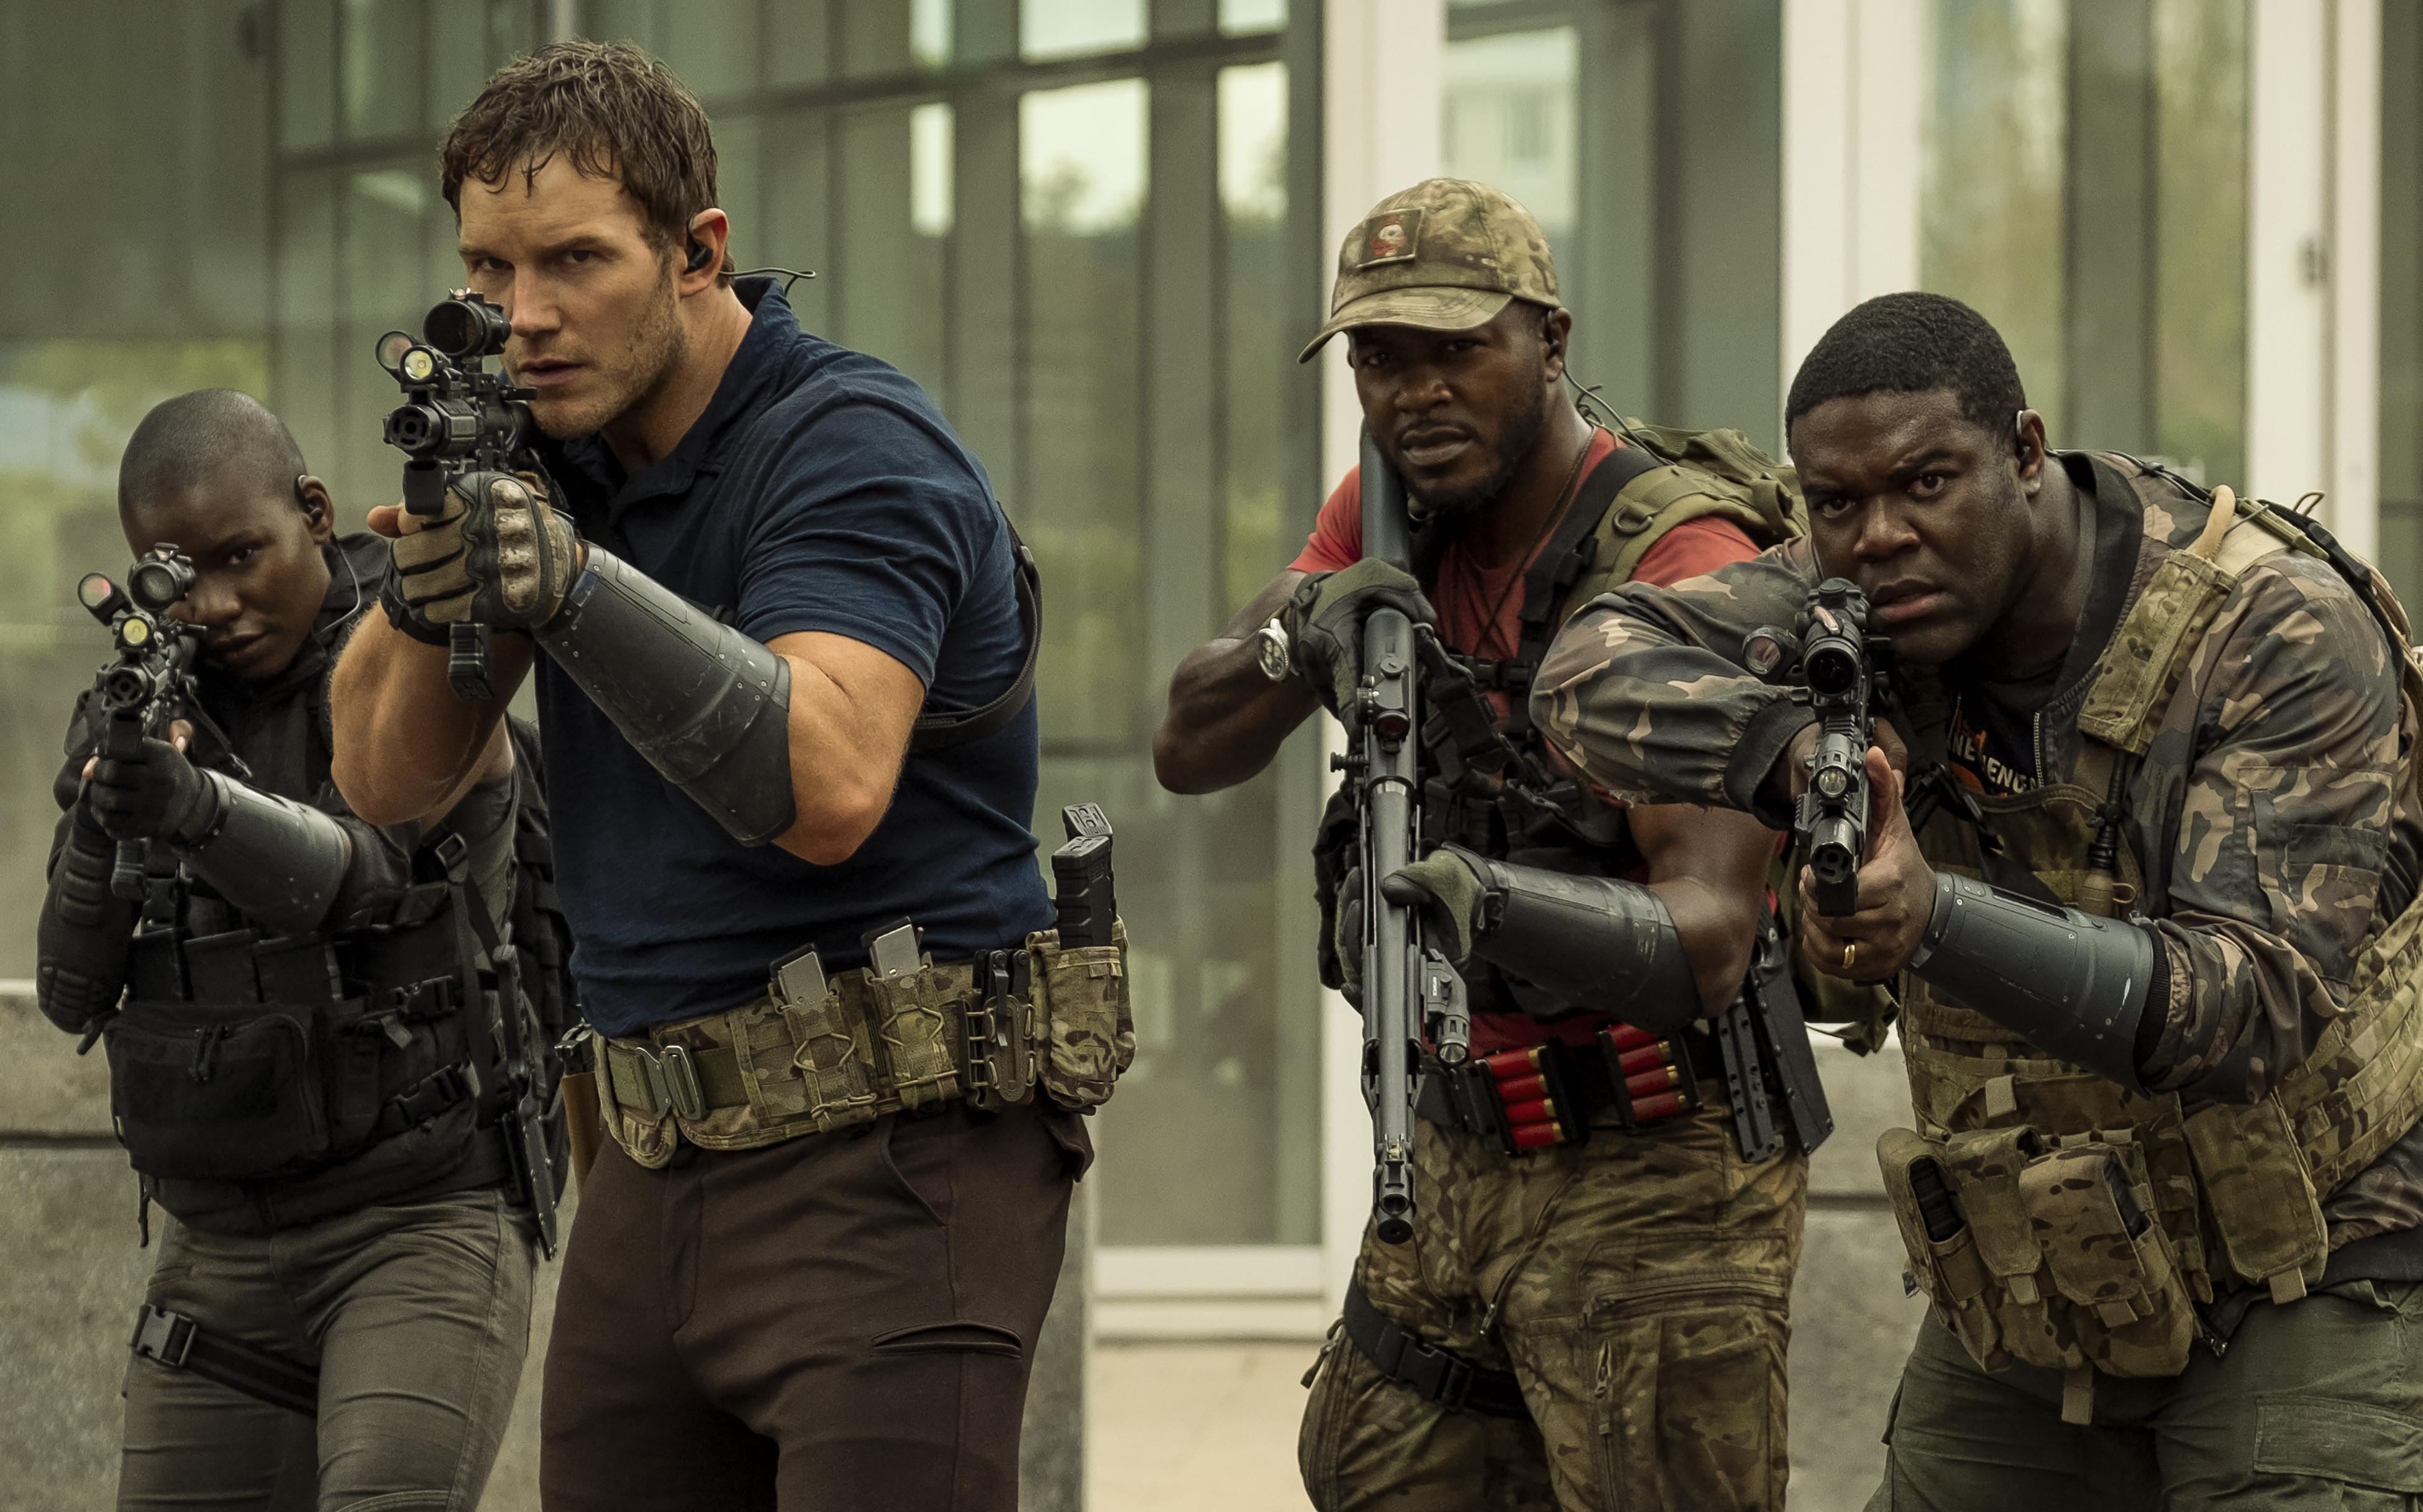 Watch The First Trailer For Chris Pratt's Sci-Fi Epic 'The Tomorrow War'